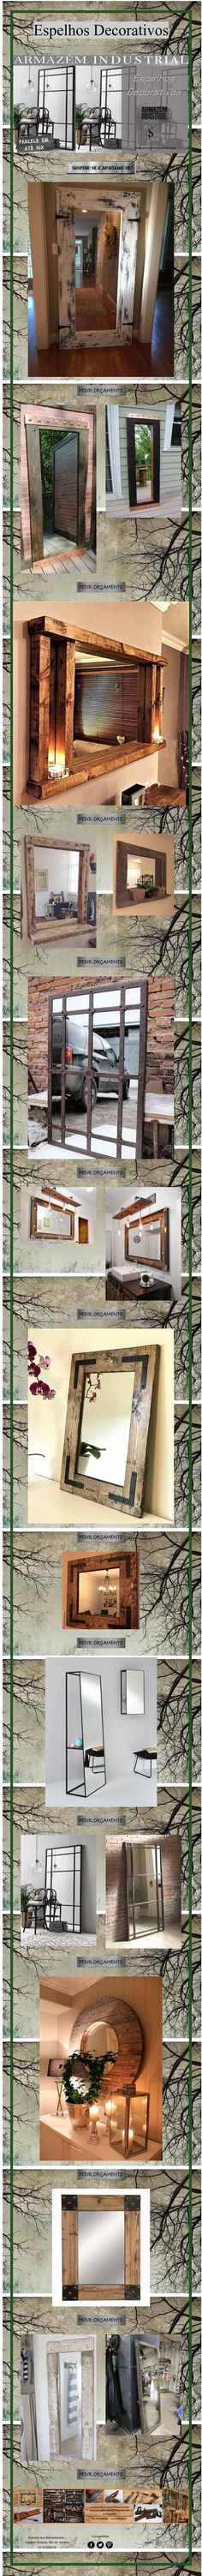 Espelhos Decorativos Bed Sets, Decorative Mirrors, Houses